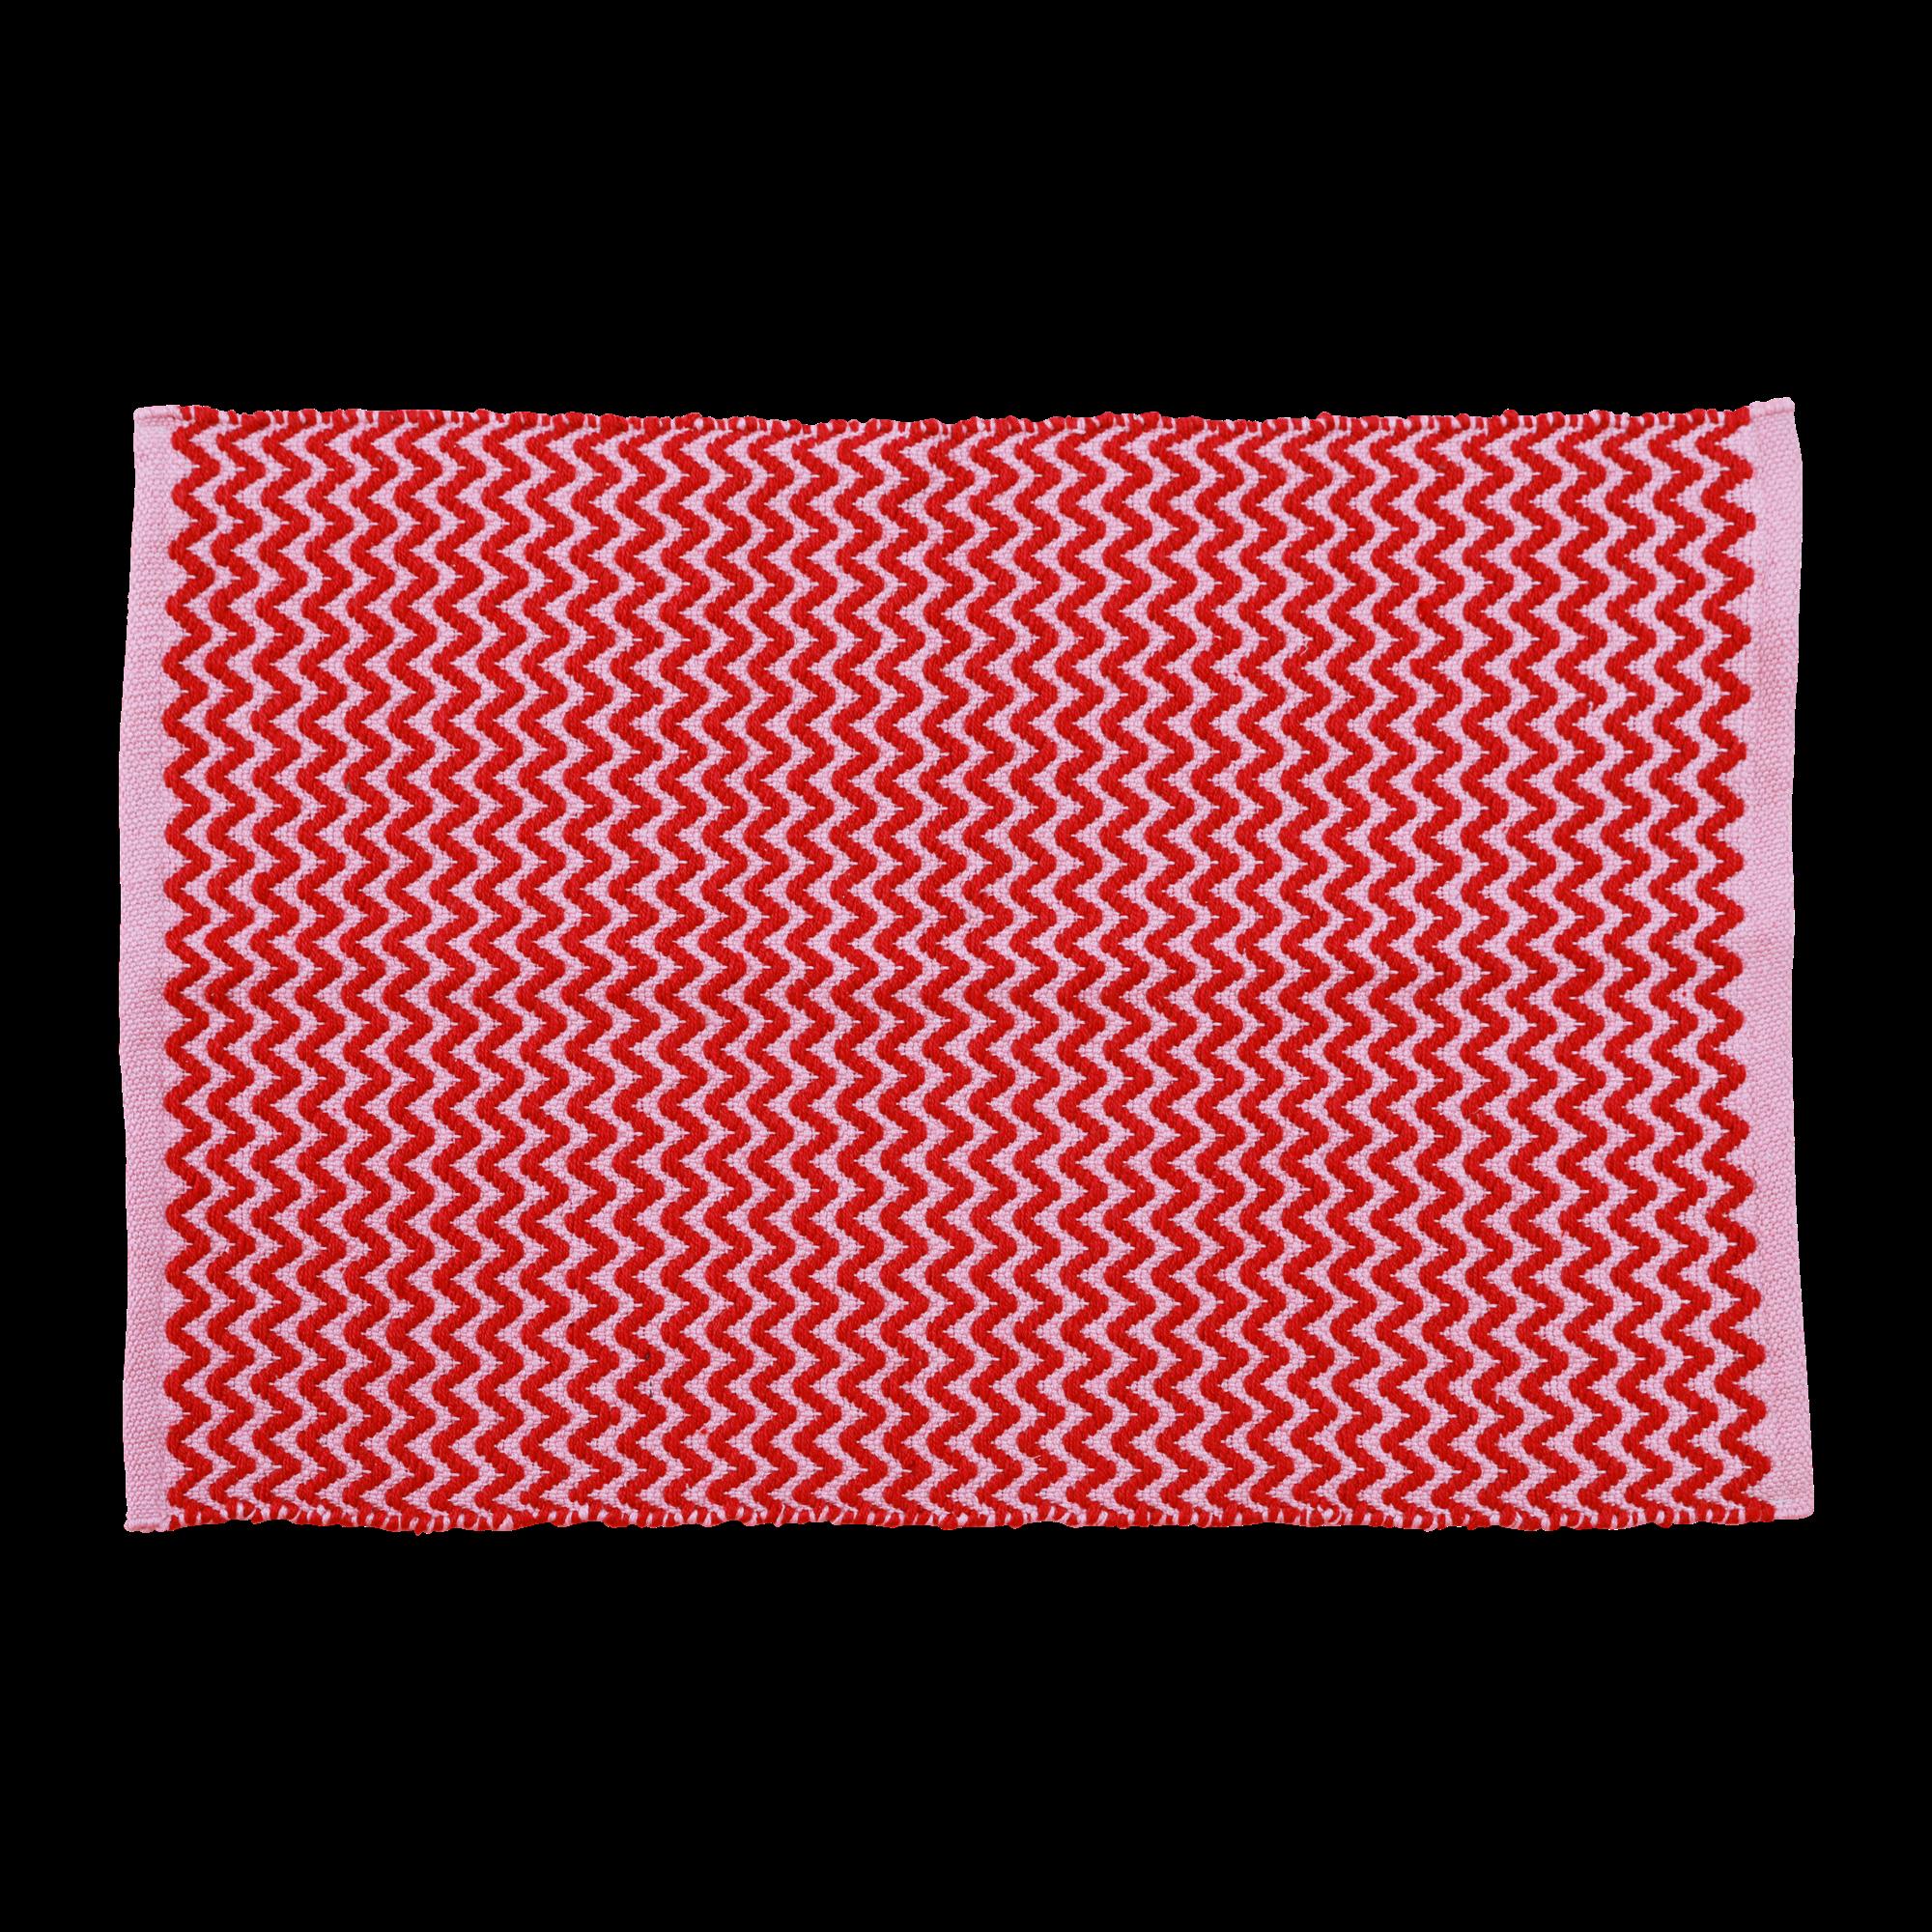 Rice - Handmade Recycled Plastic Floormat 60 x 90 cm - Red & Pink Zig Zag